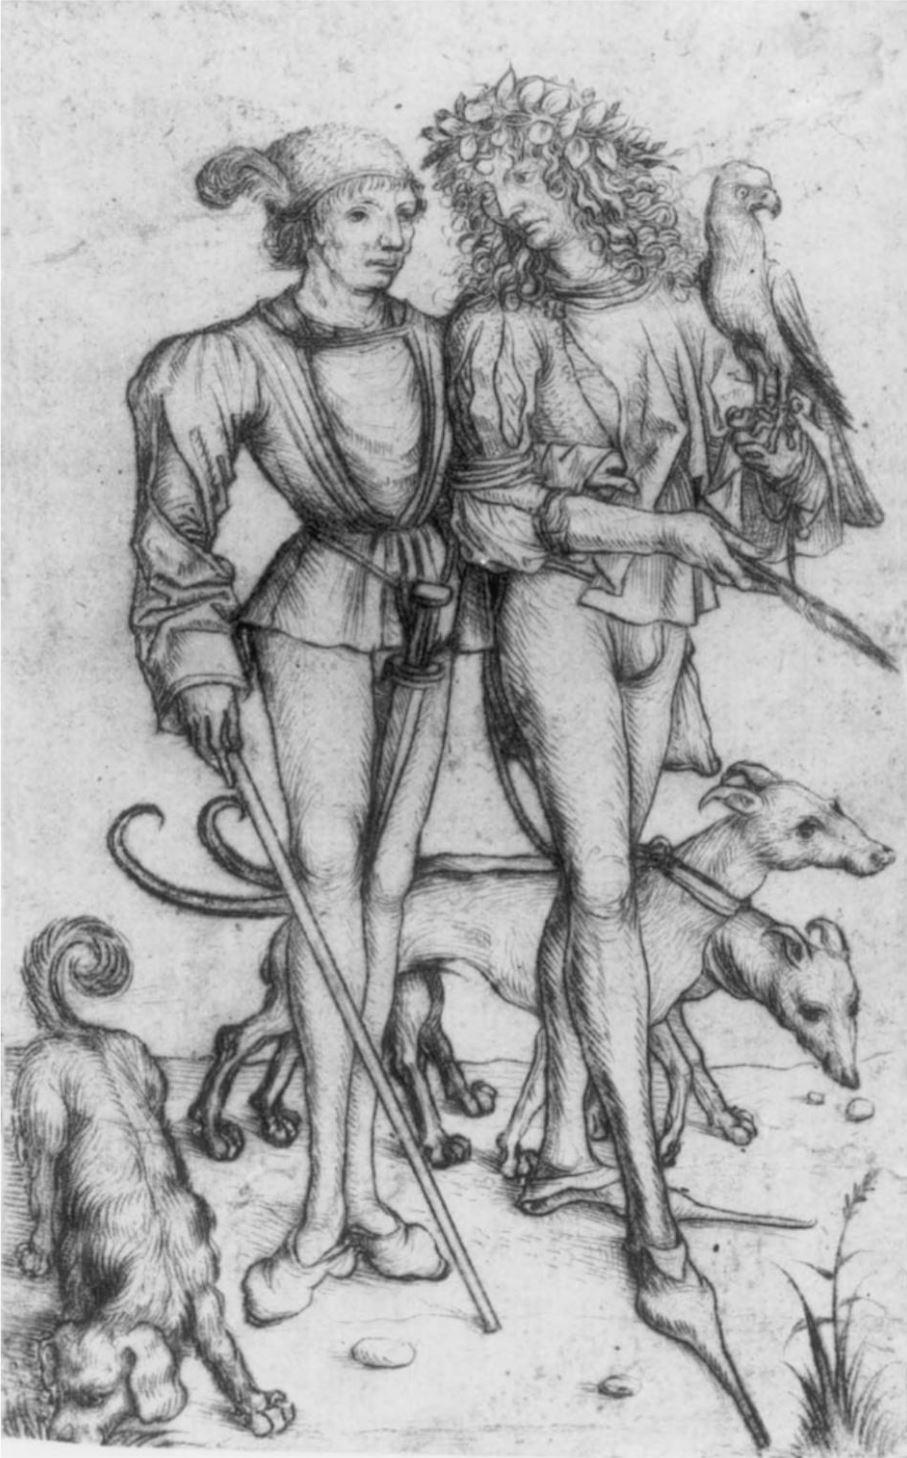 Meister des Amsterdamer Kabinetts 1485 Fauconnier detail mains